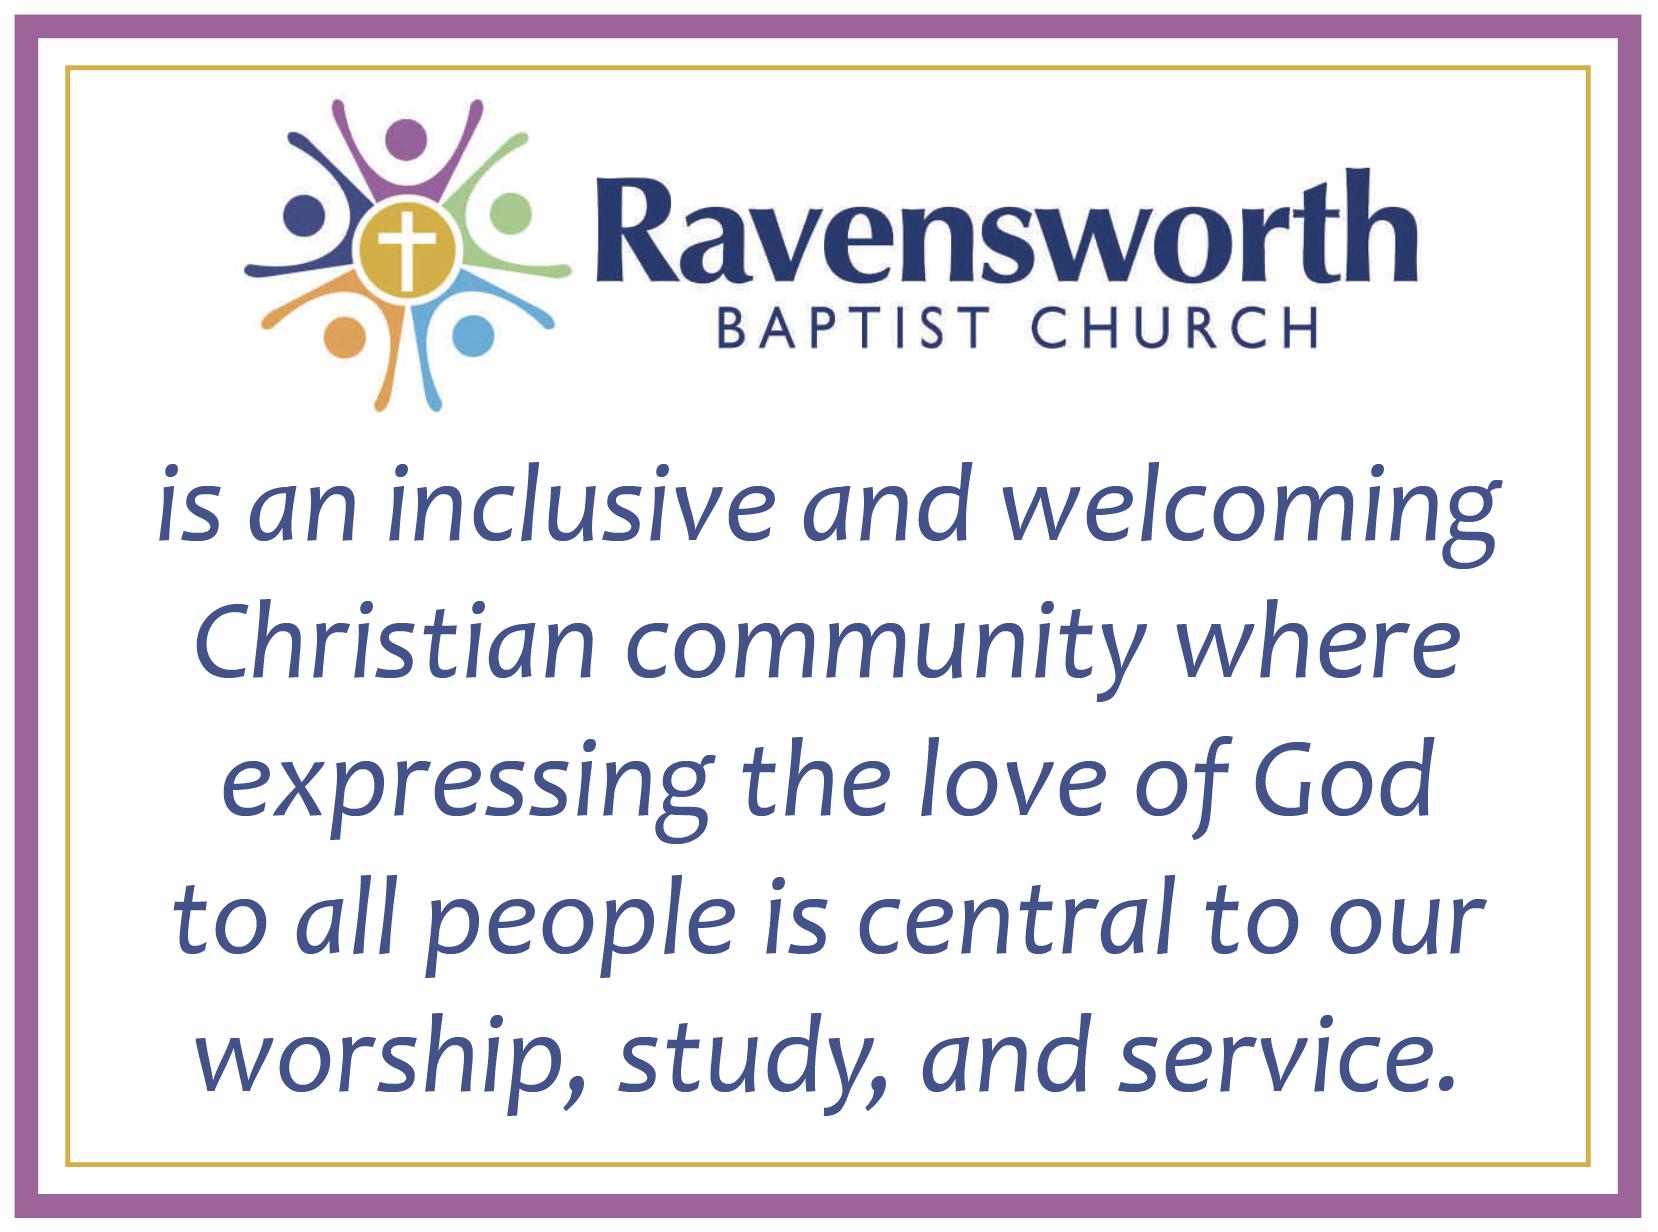 Ravensworth Identity Statement